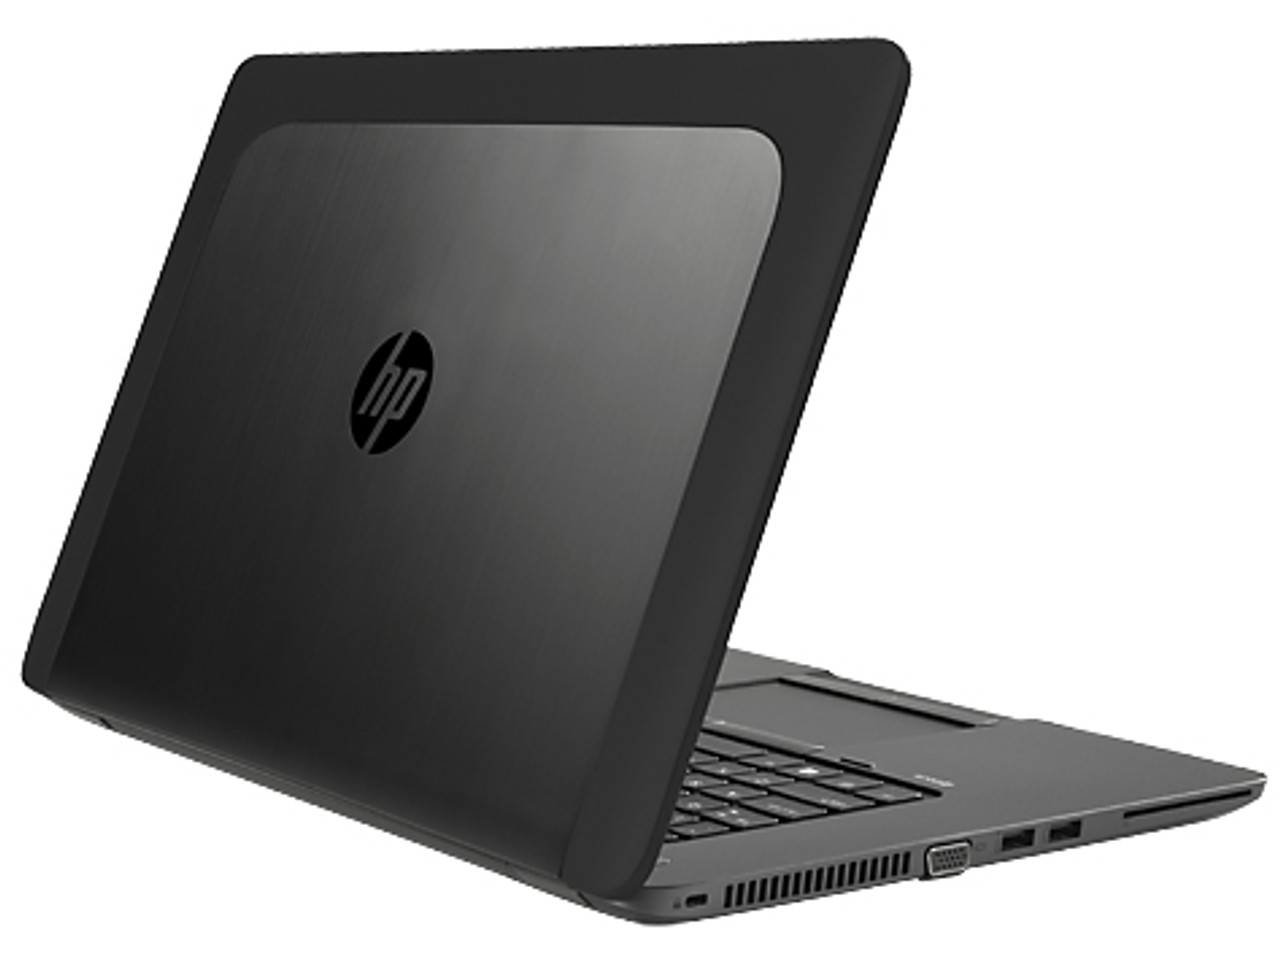 HP ZBook 17 Mobile Workstation 17 3